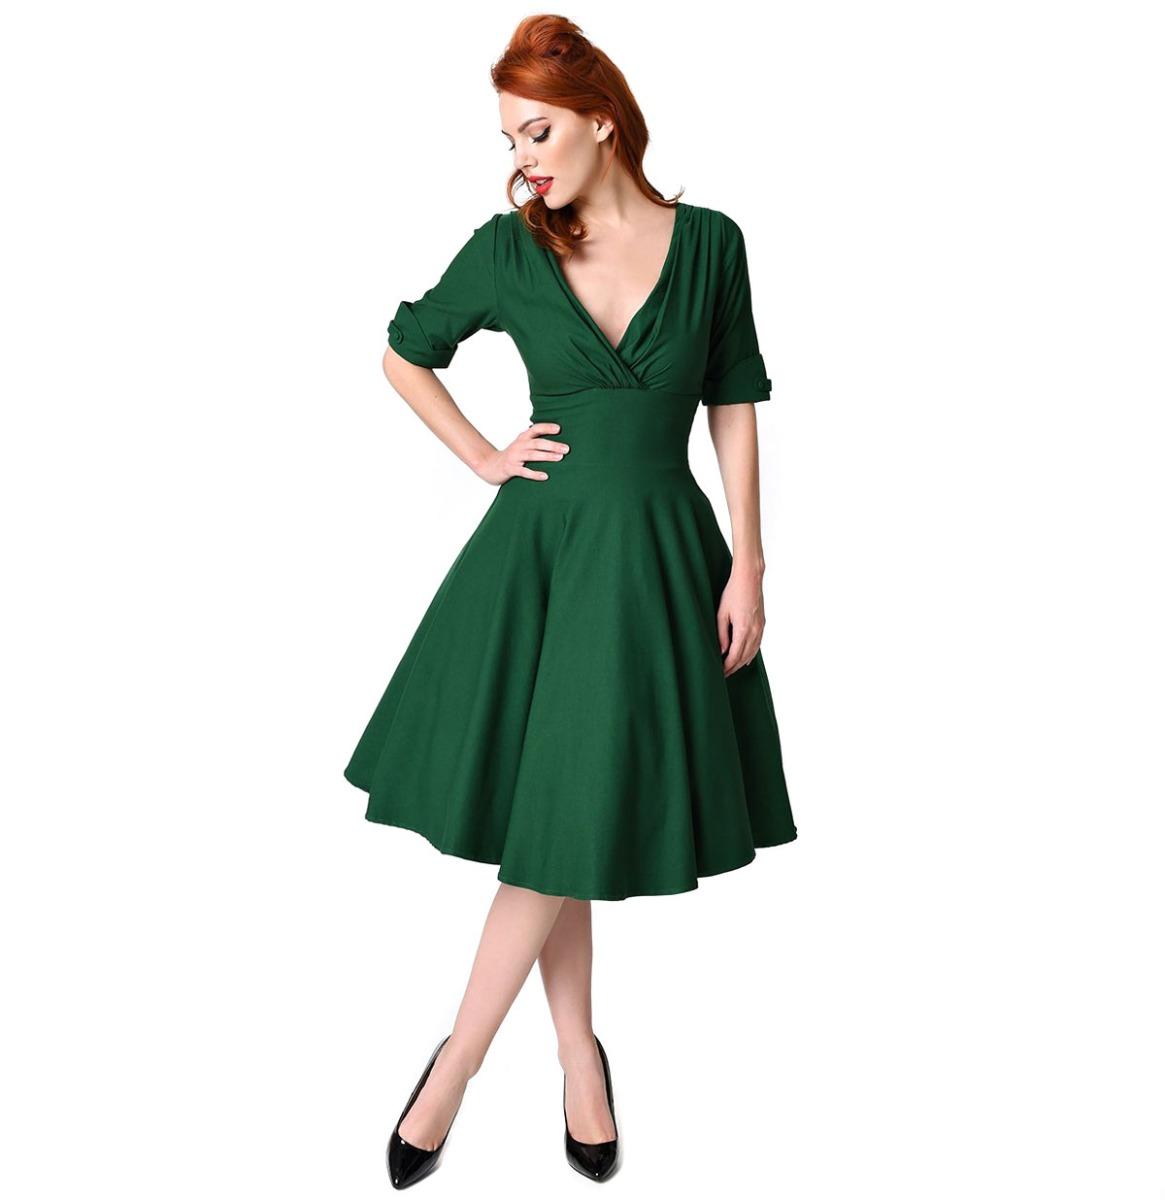 Delores Swing Dress Green